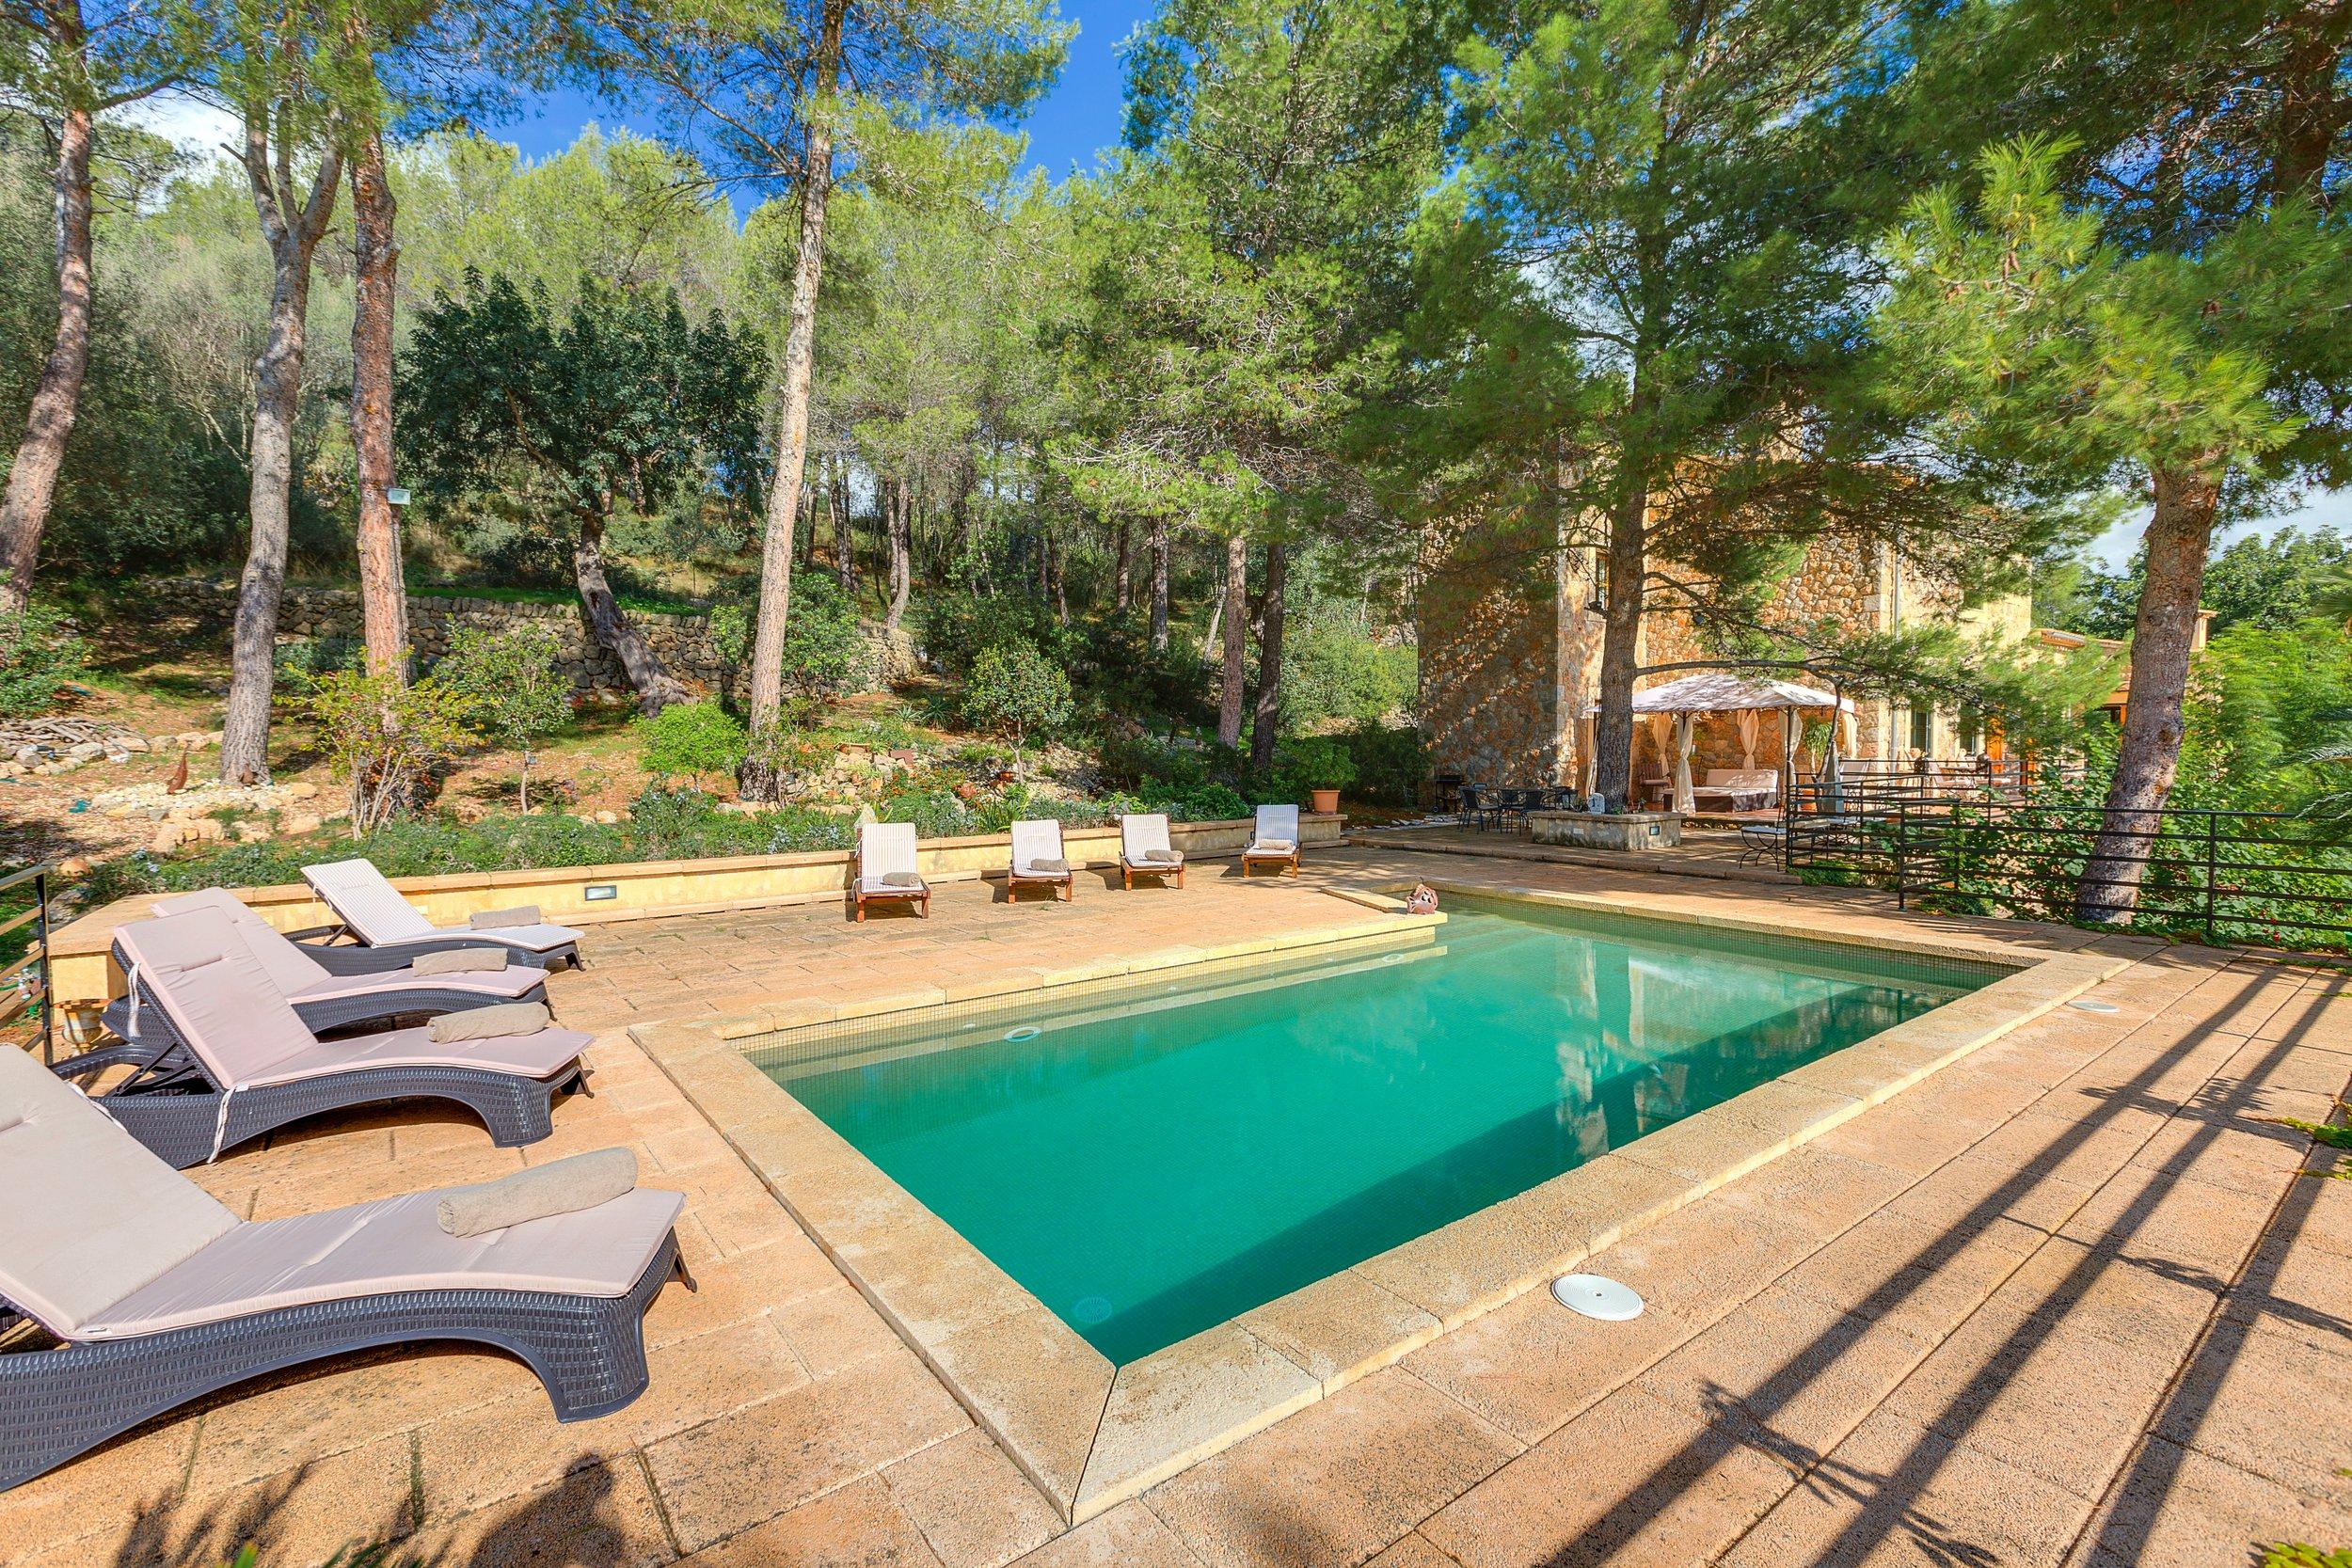 Maison de vacances Villa Cirera in Alaro (2611793), Alaro, Majorque, Iles Baléares, Espagne, image 4